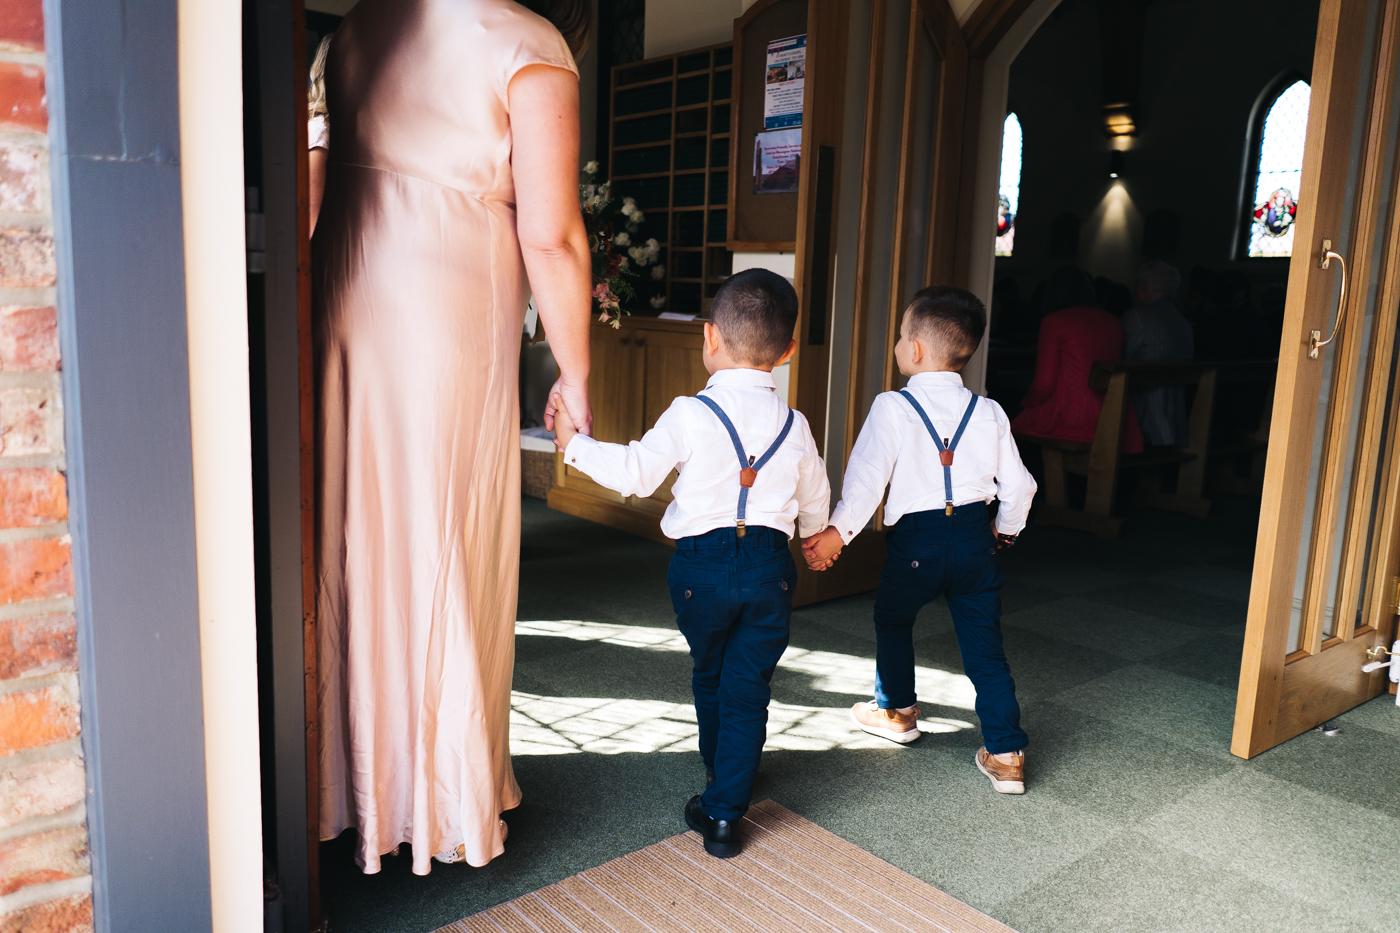 wedding-at-the-pheasant-harome-helmsley-north-yorkshire-wedding-photographer-0012.jpg